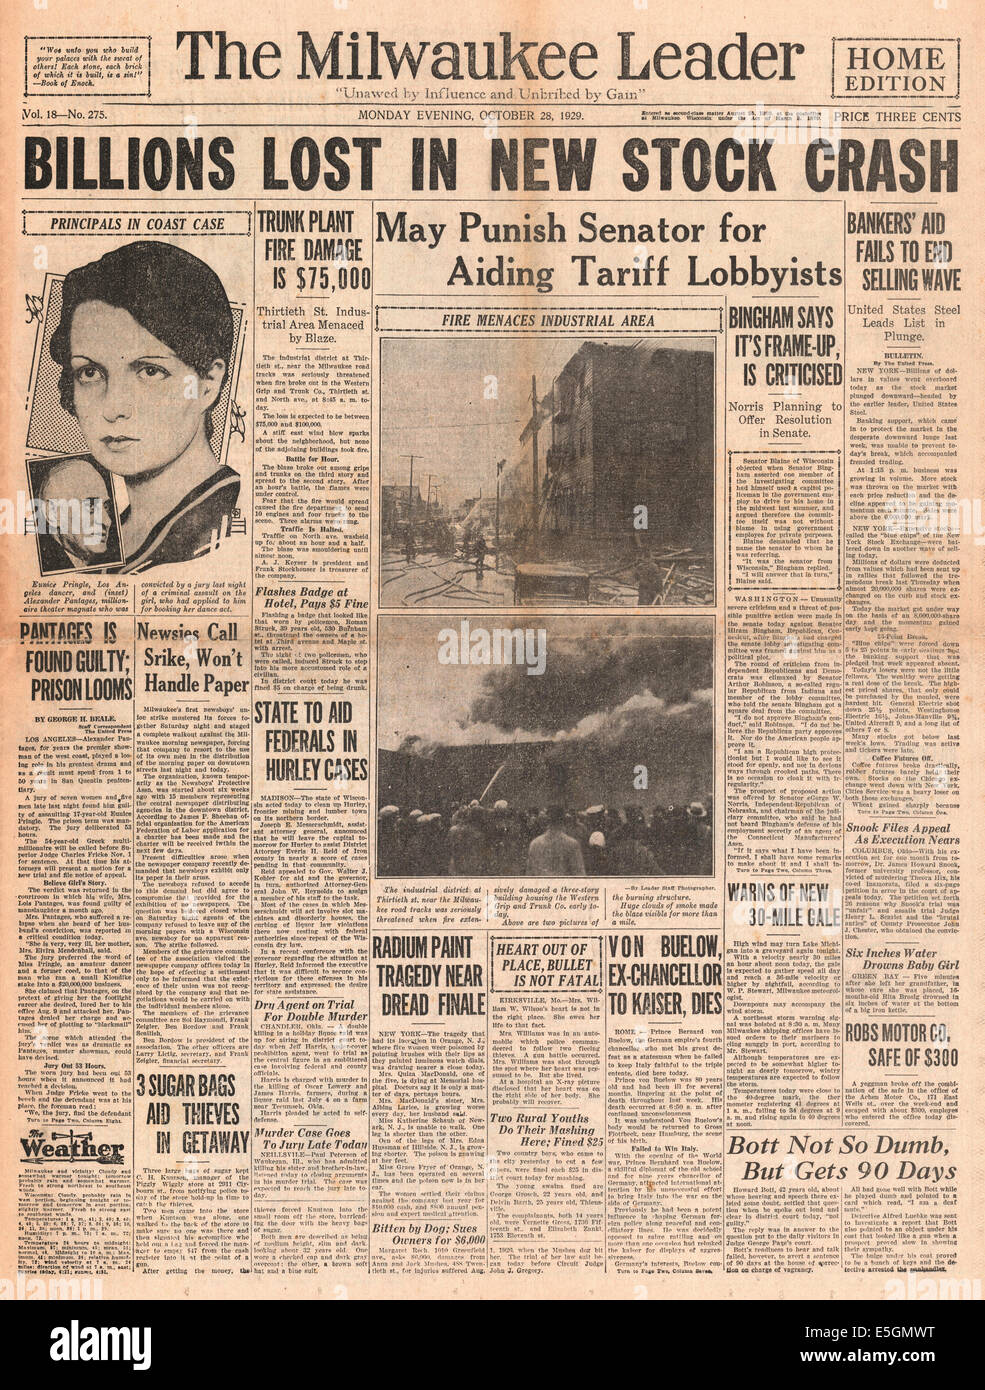 1929 Milwaukee Journal (EE.UU.) Página frontal informando de la caída de Wall Street Foto de stock